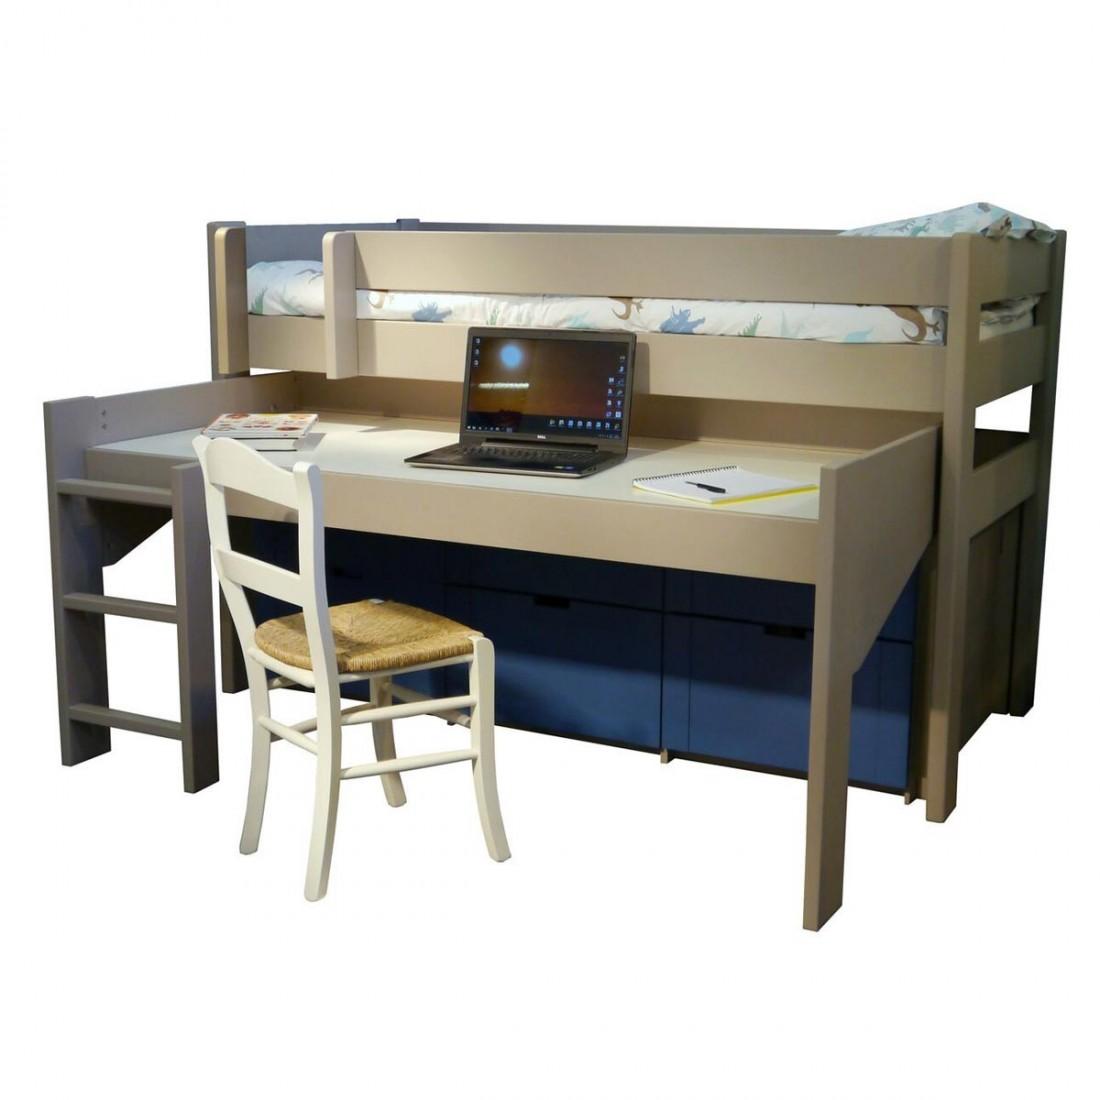 lit enfant sur lev dominique 127 mathy by bols ma. Black Bedroom Furniture Sets. Home Design Ideas